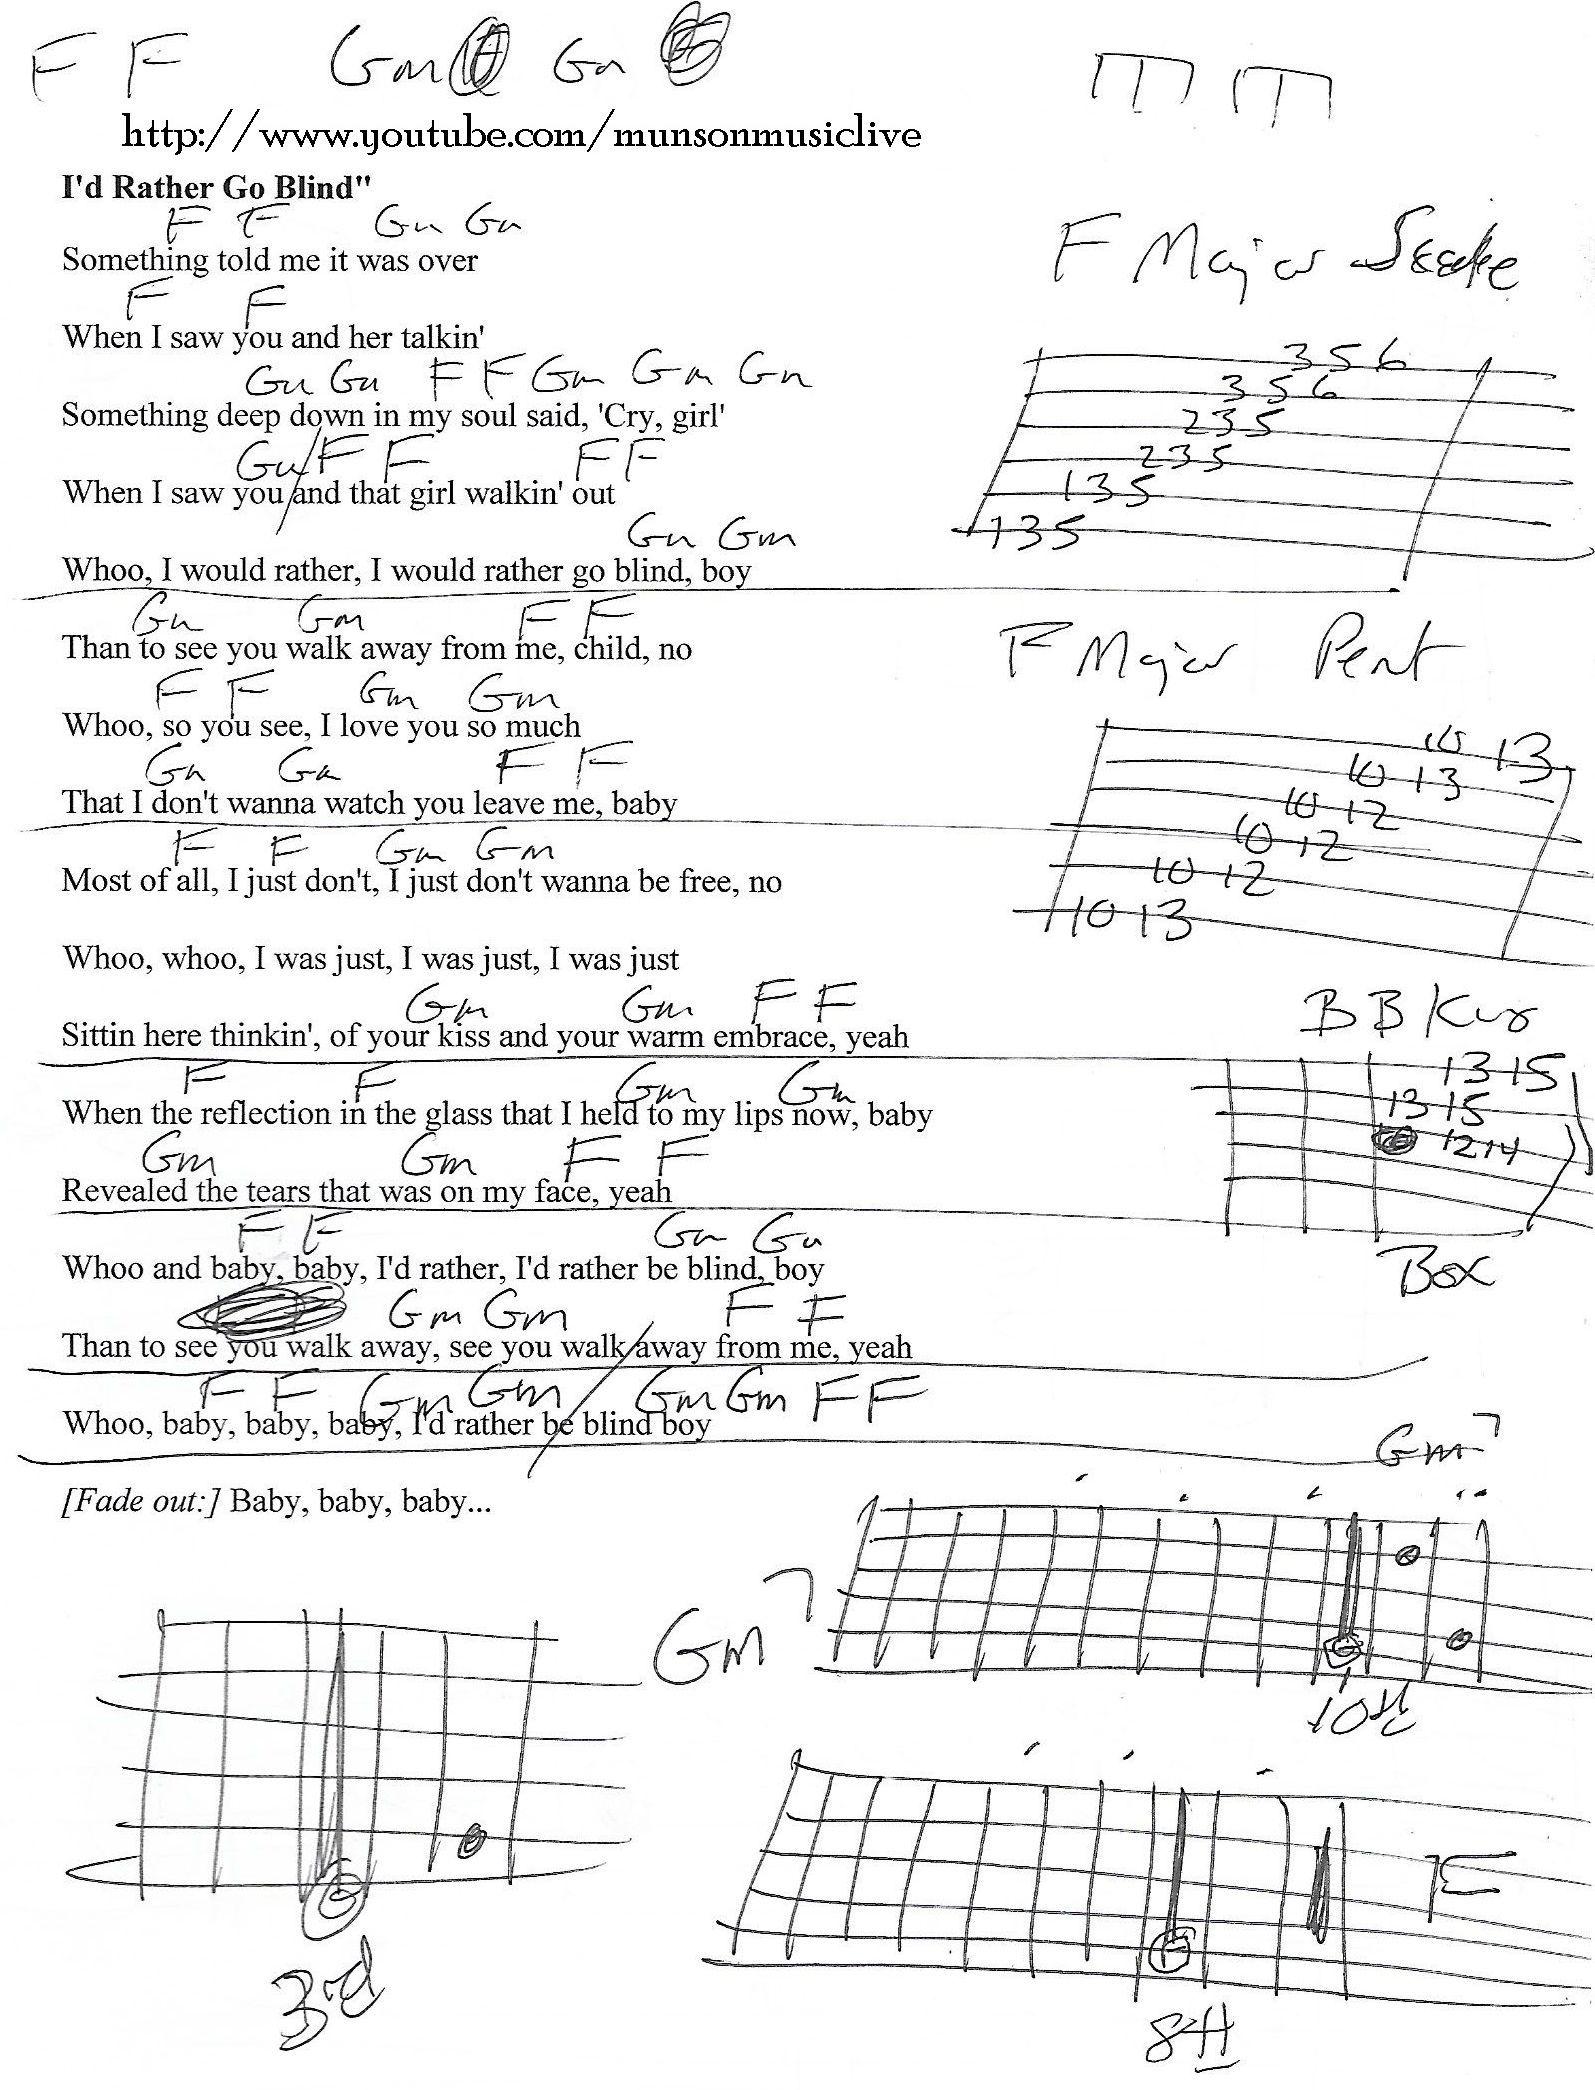 I D Rather Go Blind Guitar Chord Chart Guitar Chord Chart Guitar Songs Guitar Lessons